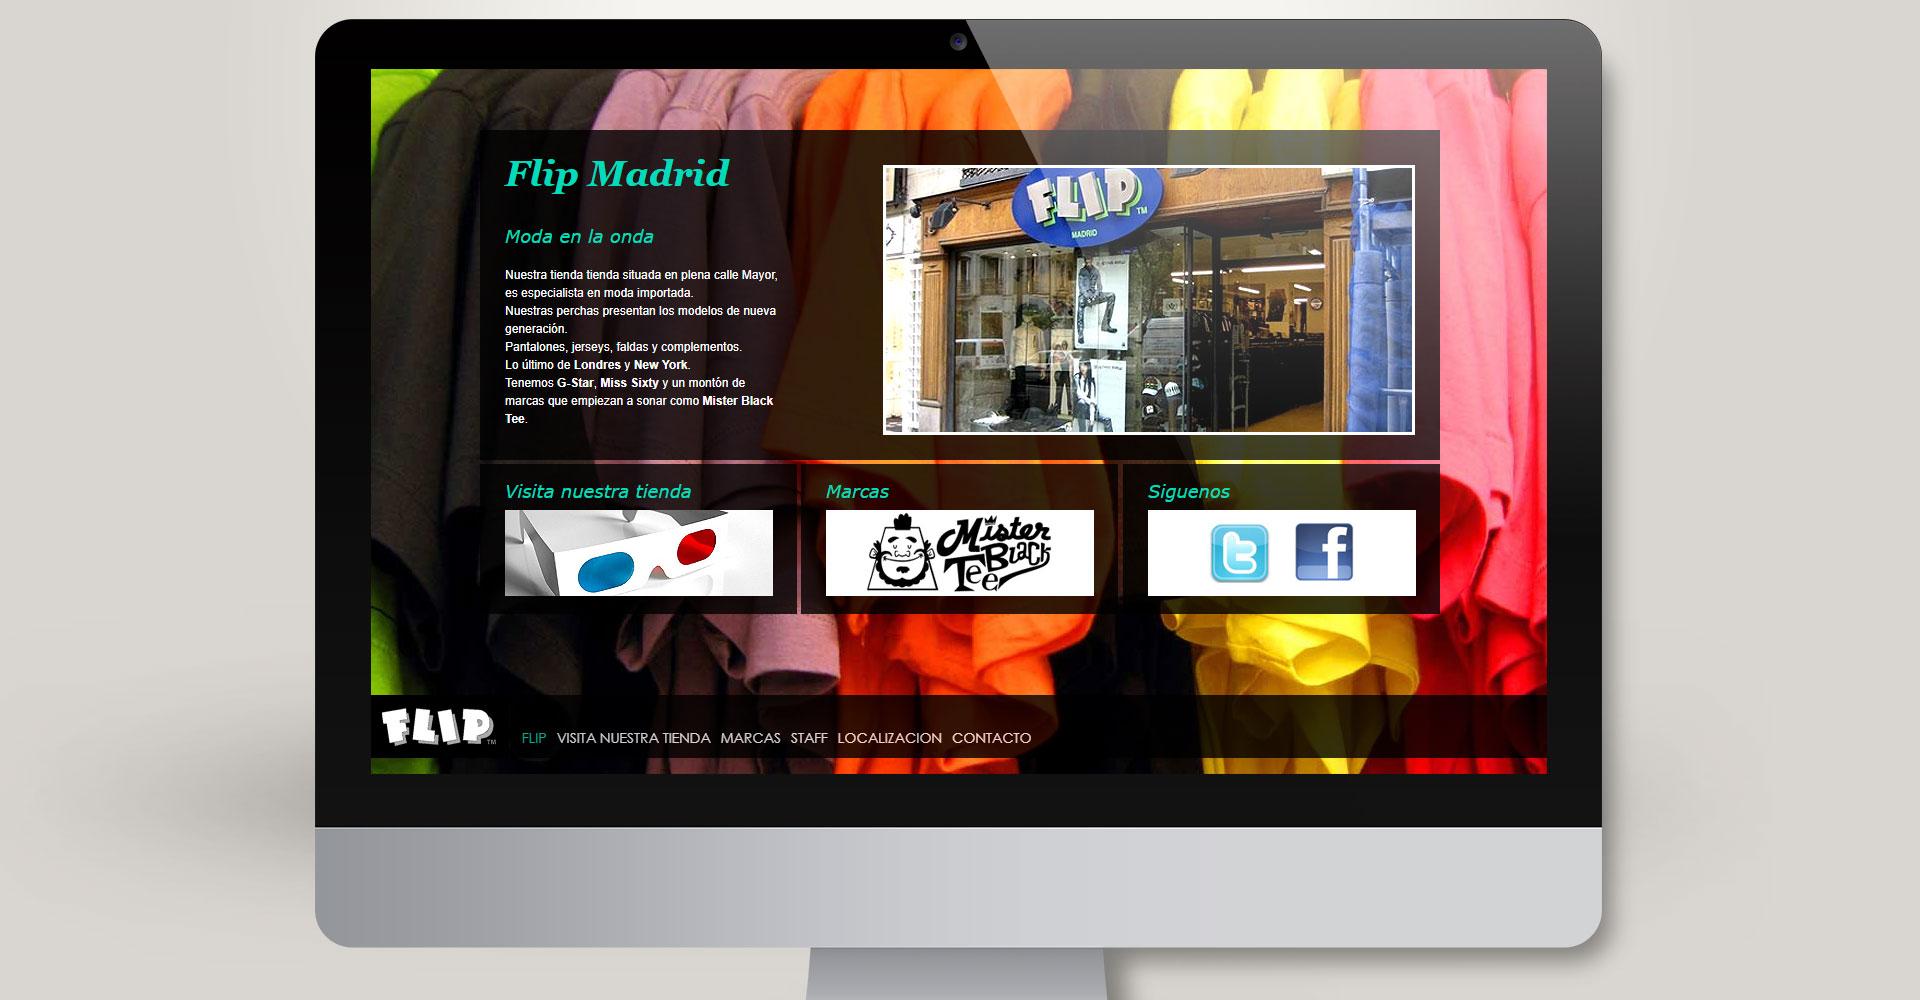 Flip Madrid